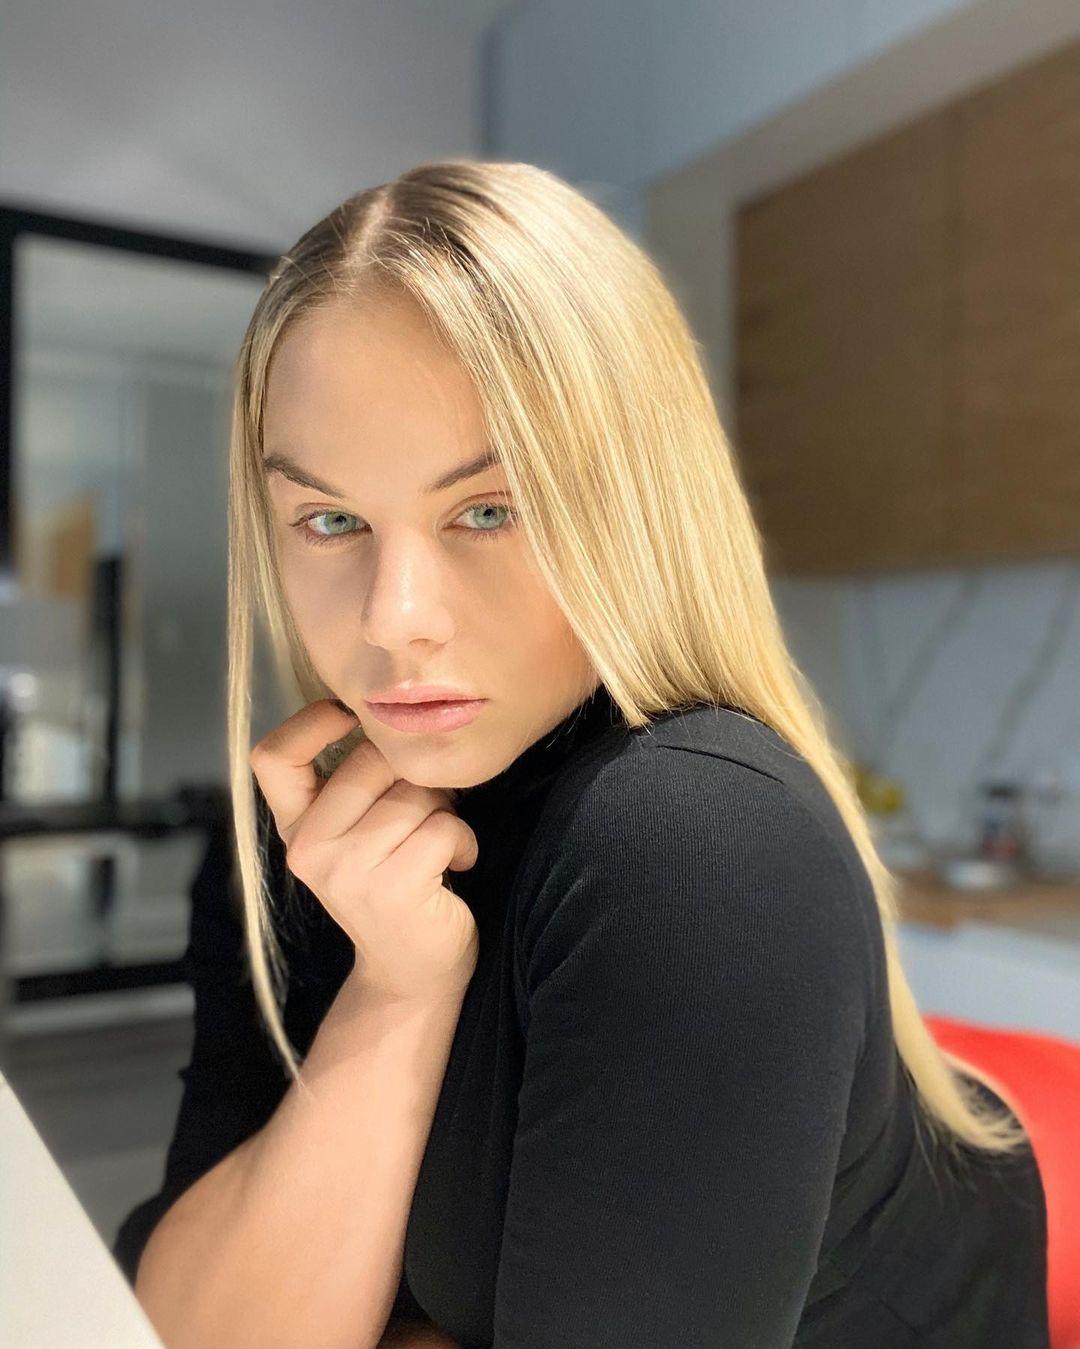 Natalia-Ejsmont-2